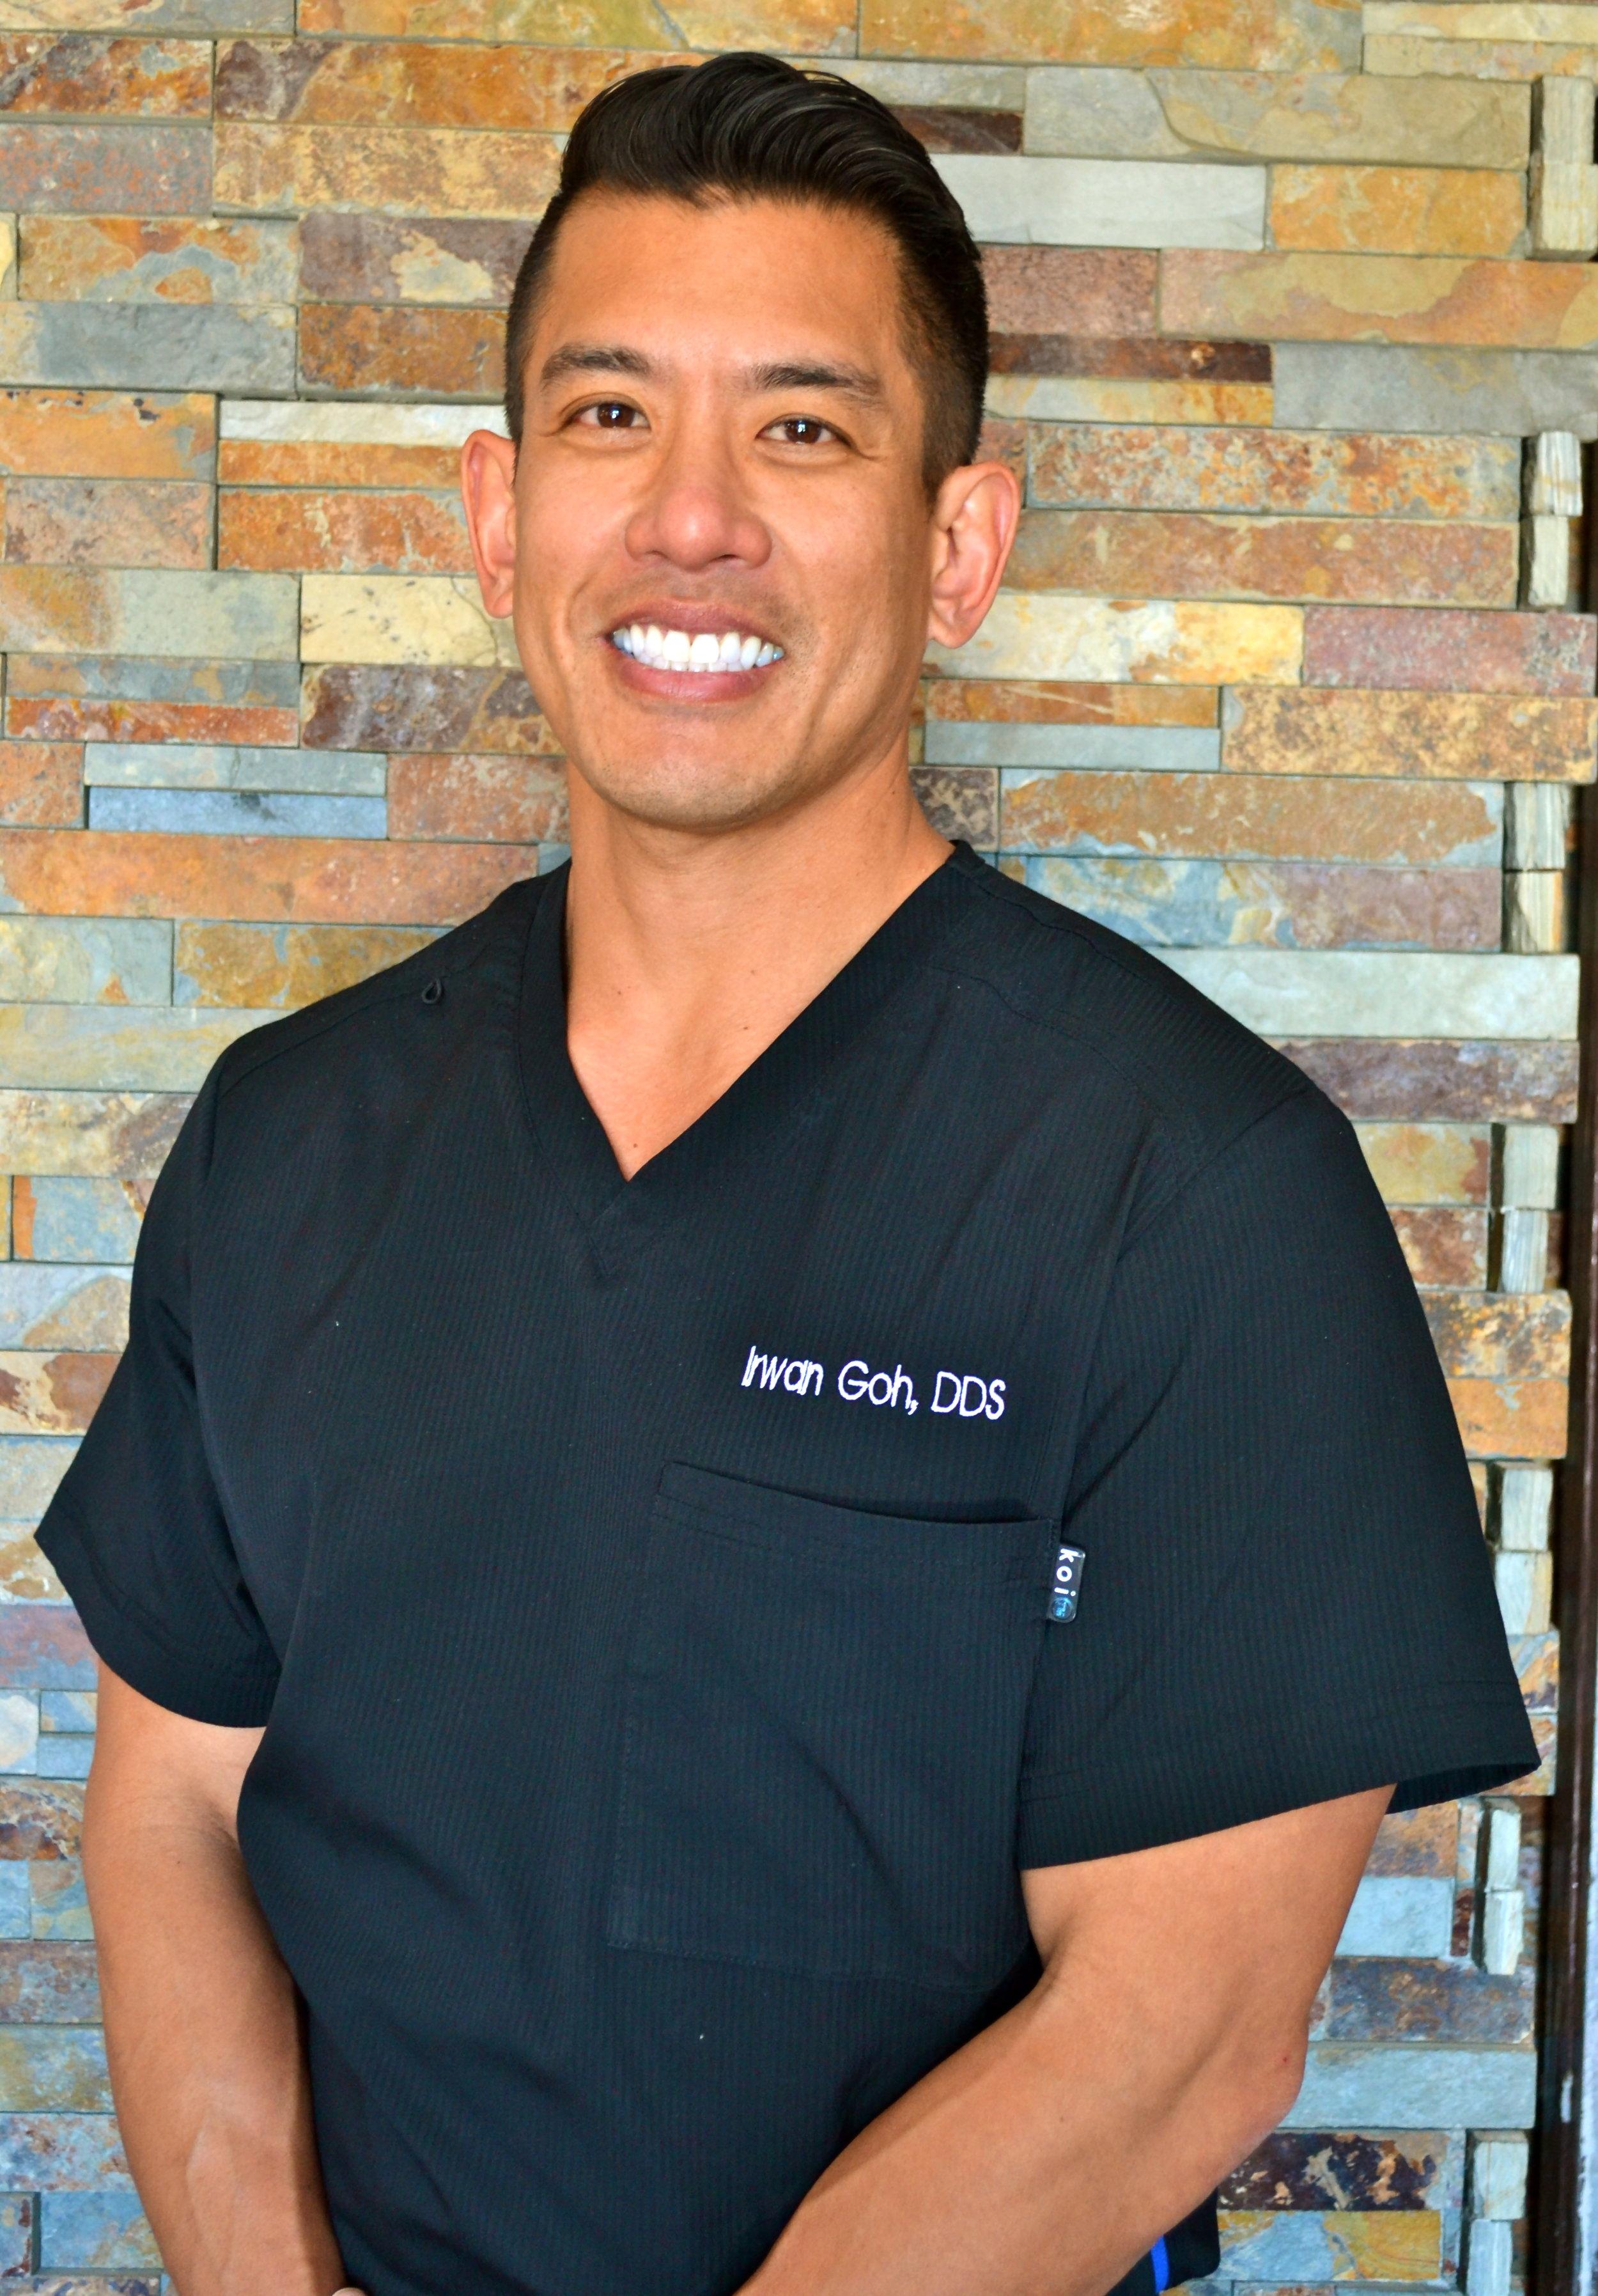 Dr. Irwan Goh